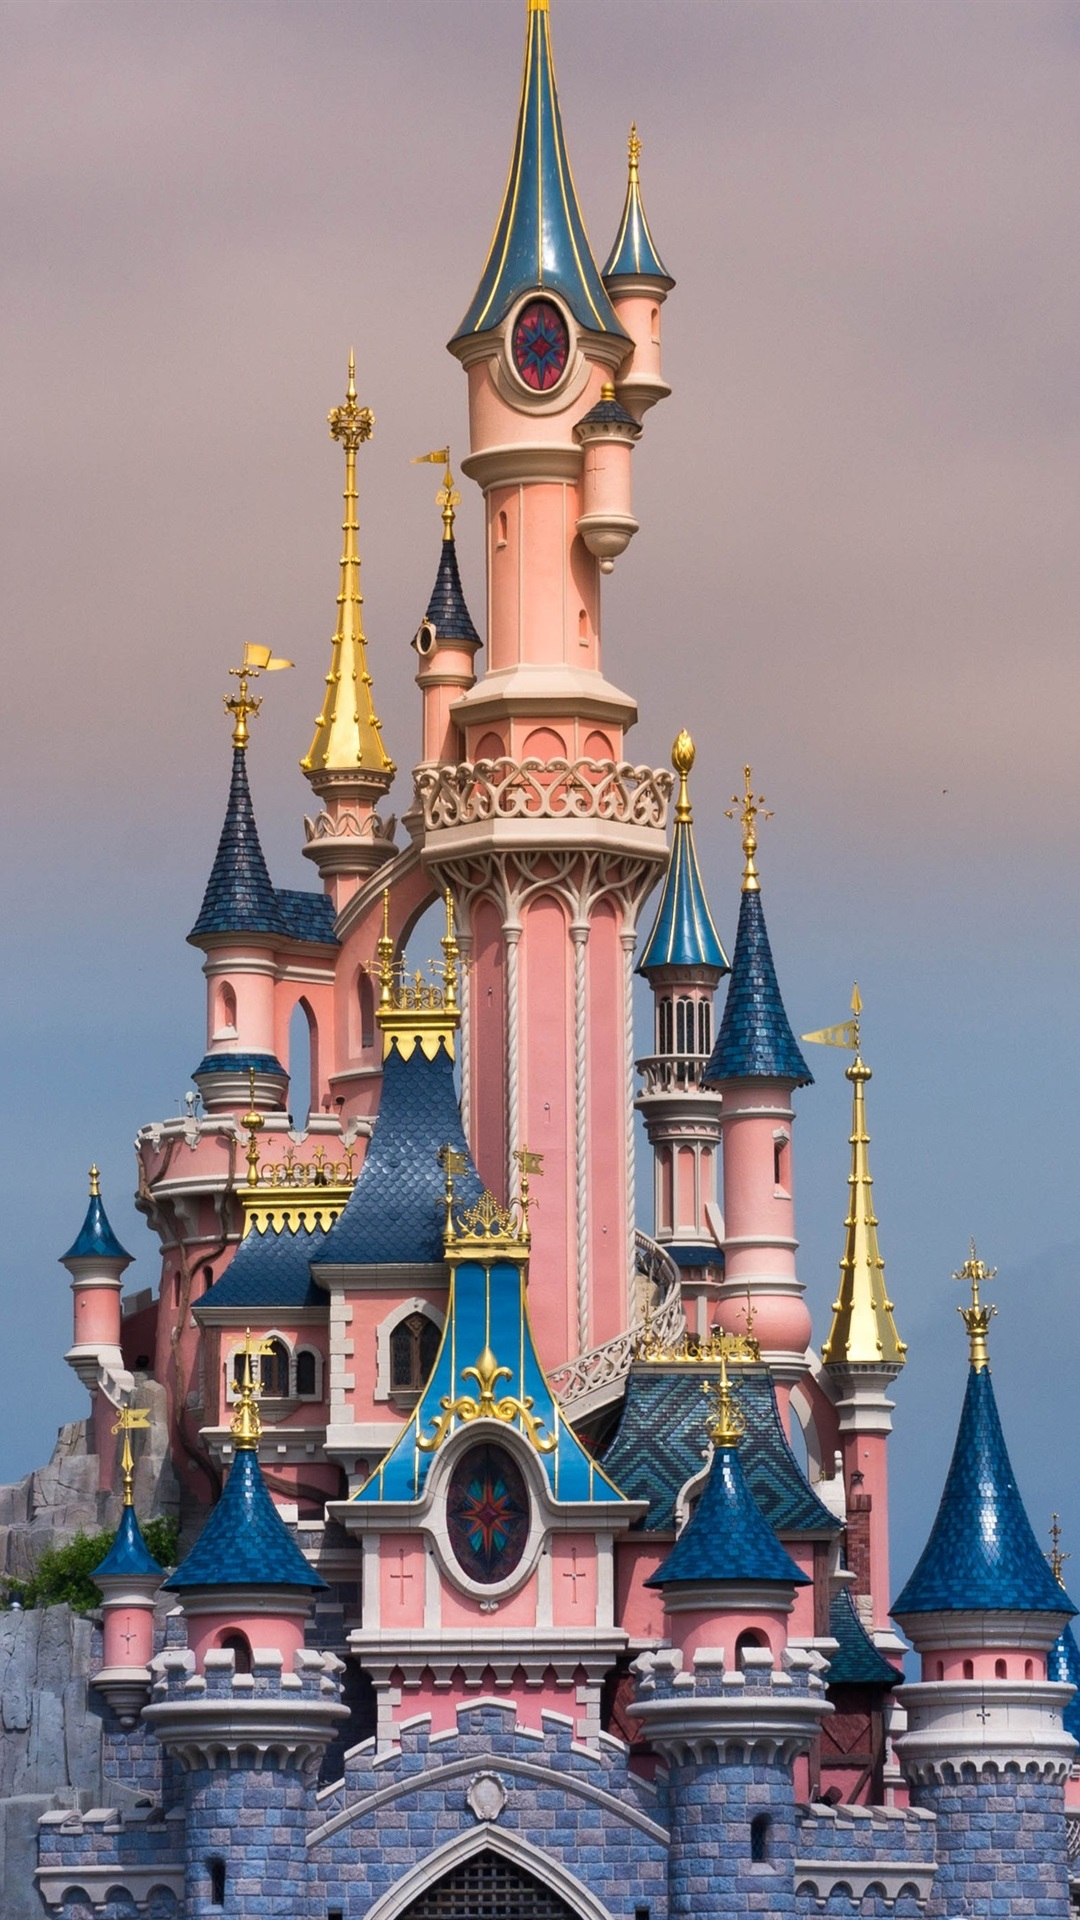 Disneyland In France Beautiful Castle 1080x1920 Iphone 8 7